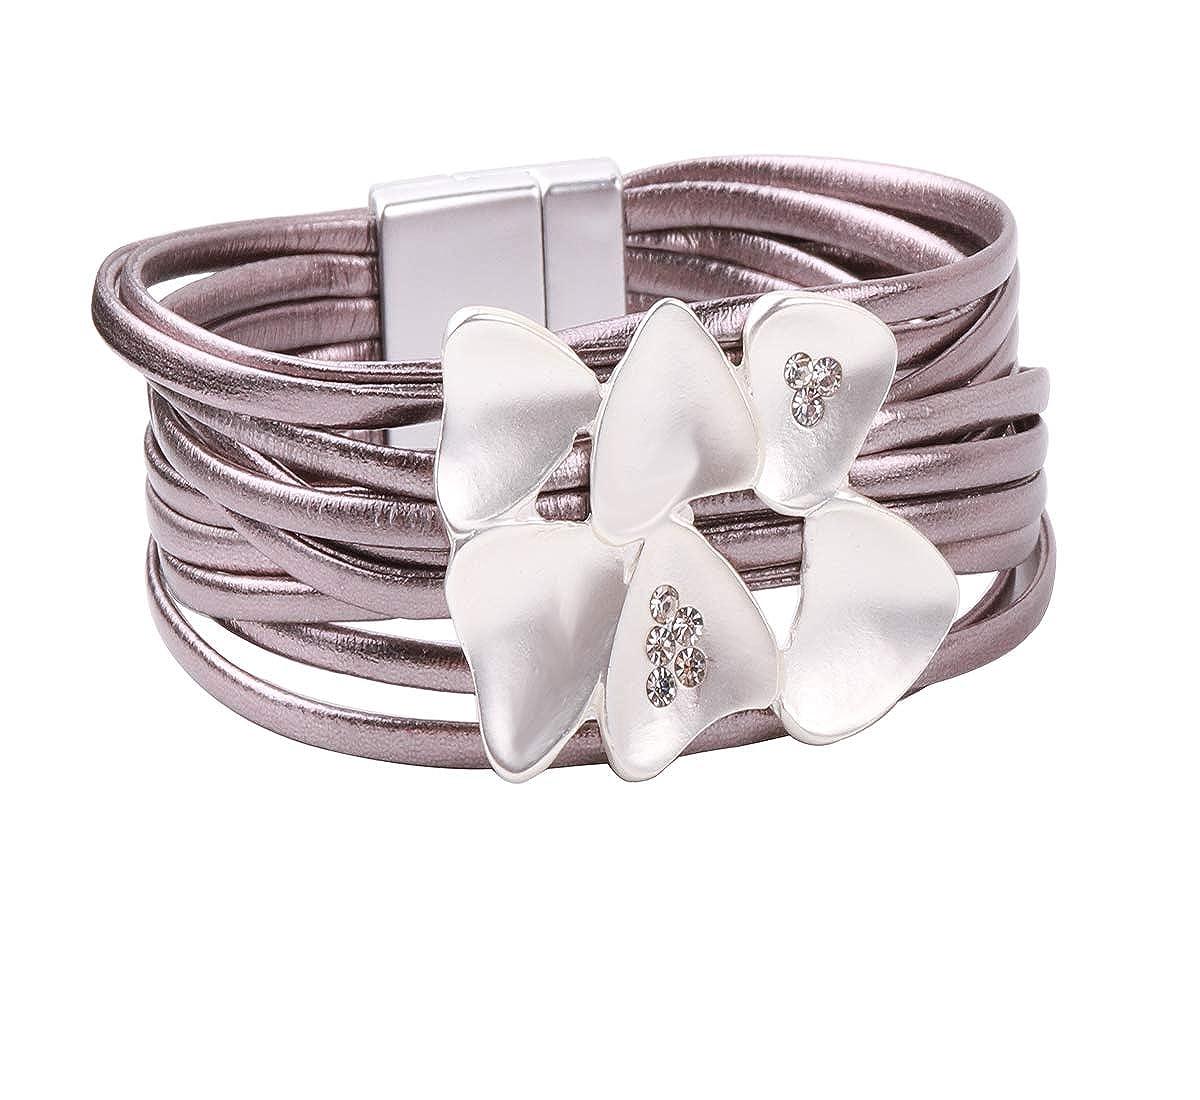 REEBOOOR Boho Leather Bracelet Leather Wrap Bracelet Handmade Woven Jewelry for Girls,Teens, Mother, Birthday Gift Birthday Gift (Grey) RE-BR18070403